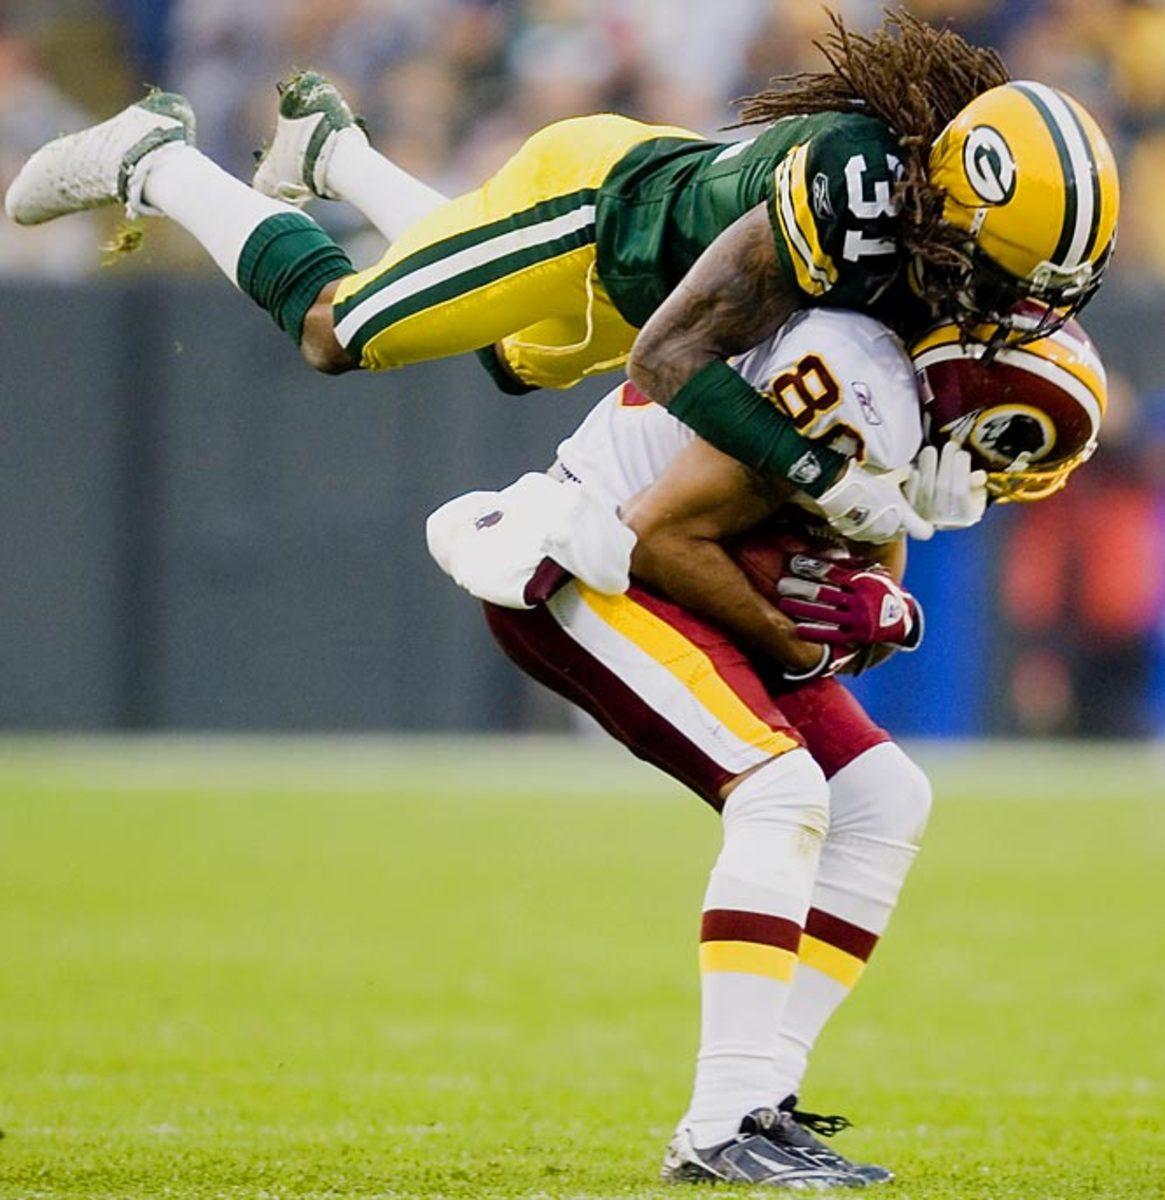 Packers 17, Redskins 14